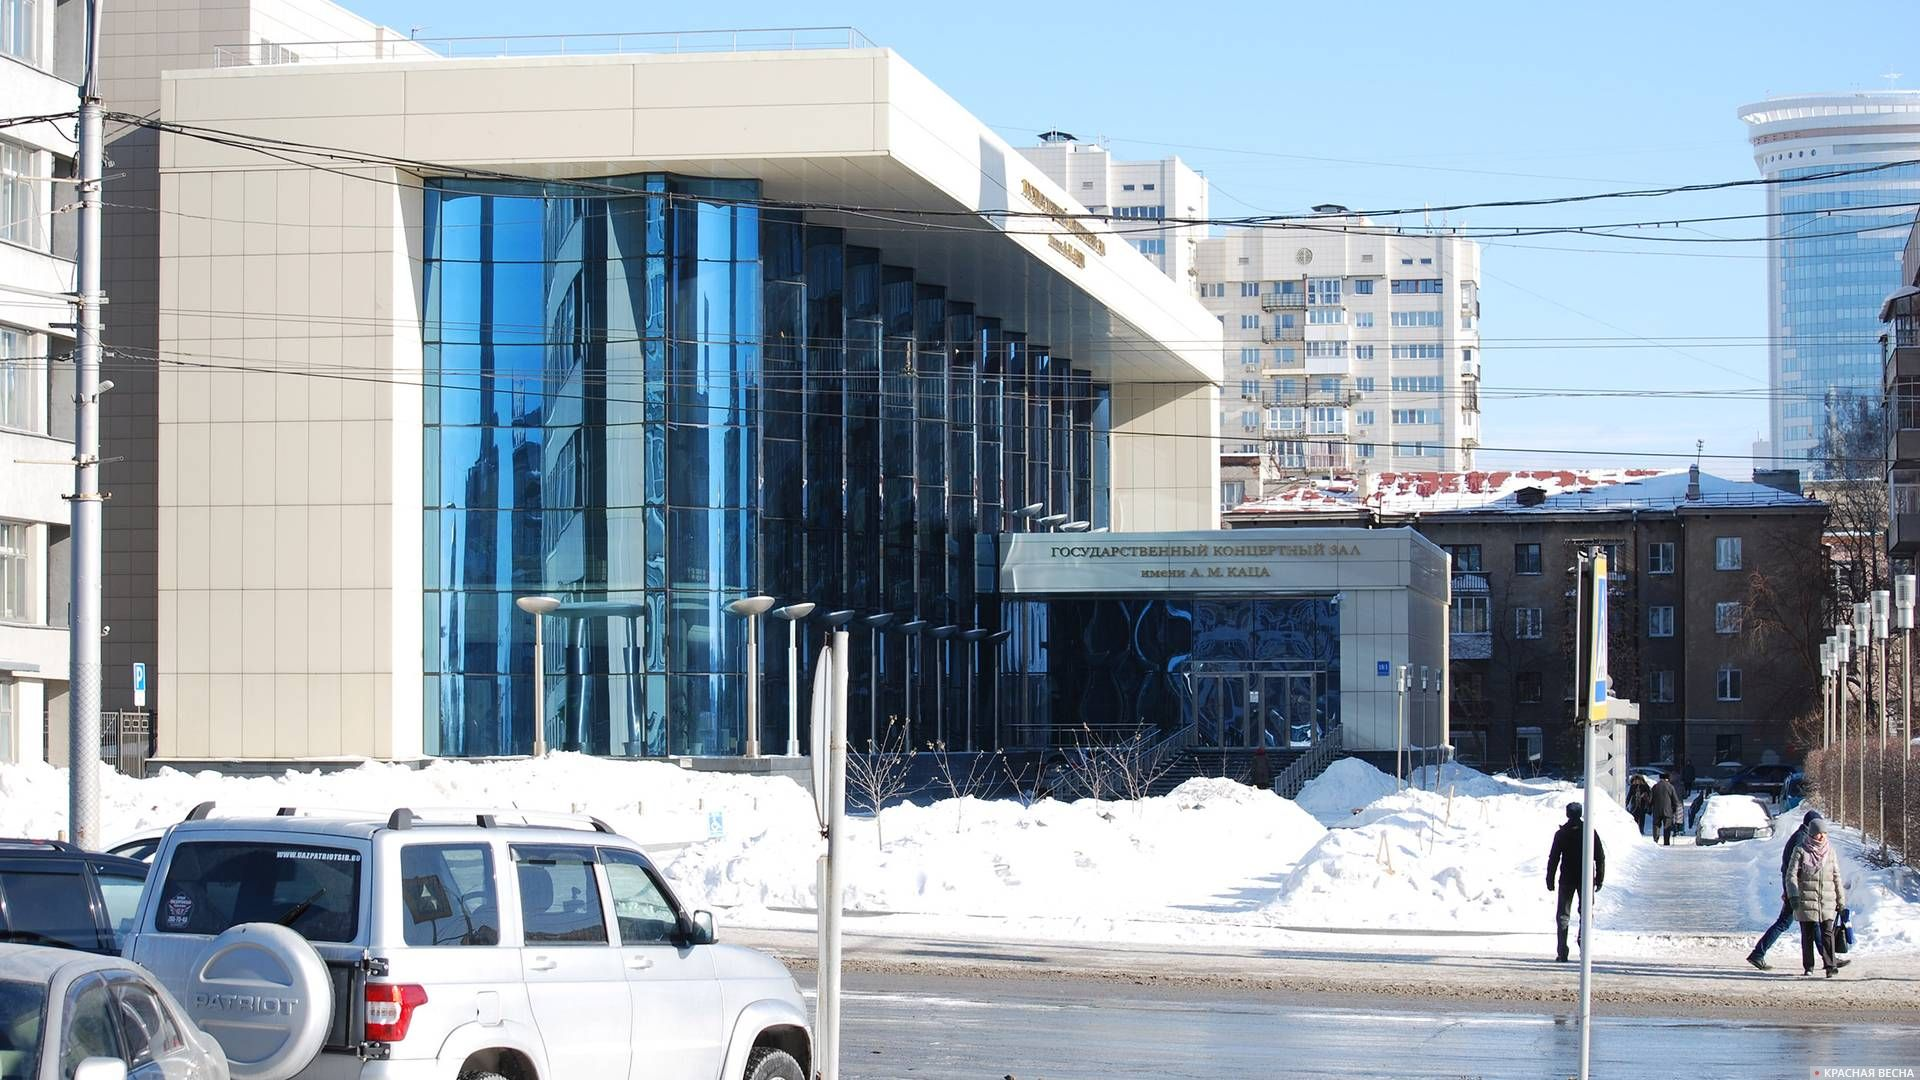 Государственный концертный зал имени А. М. Каца